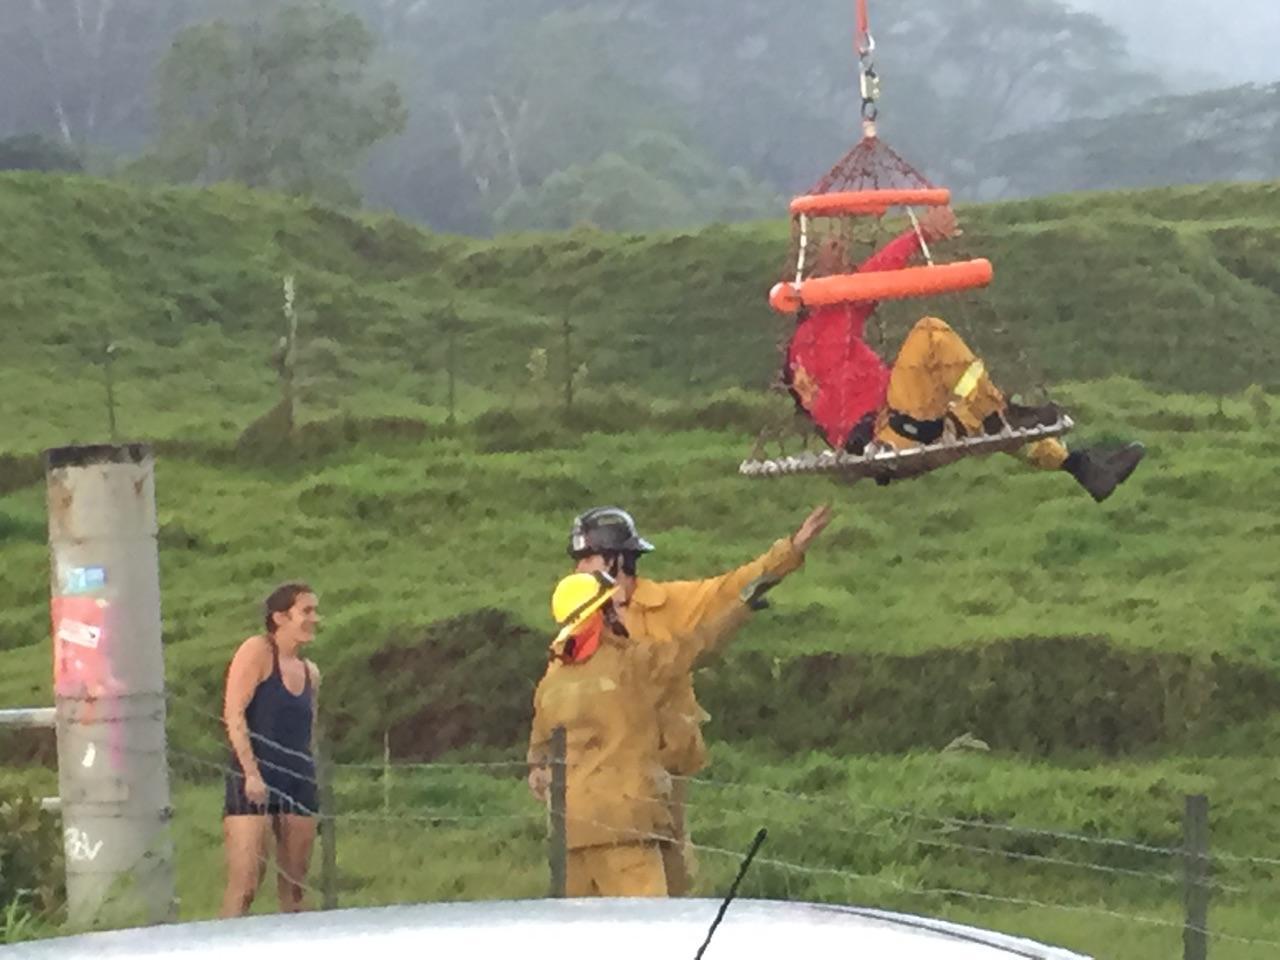 maui hiker rescue-2_93012